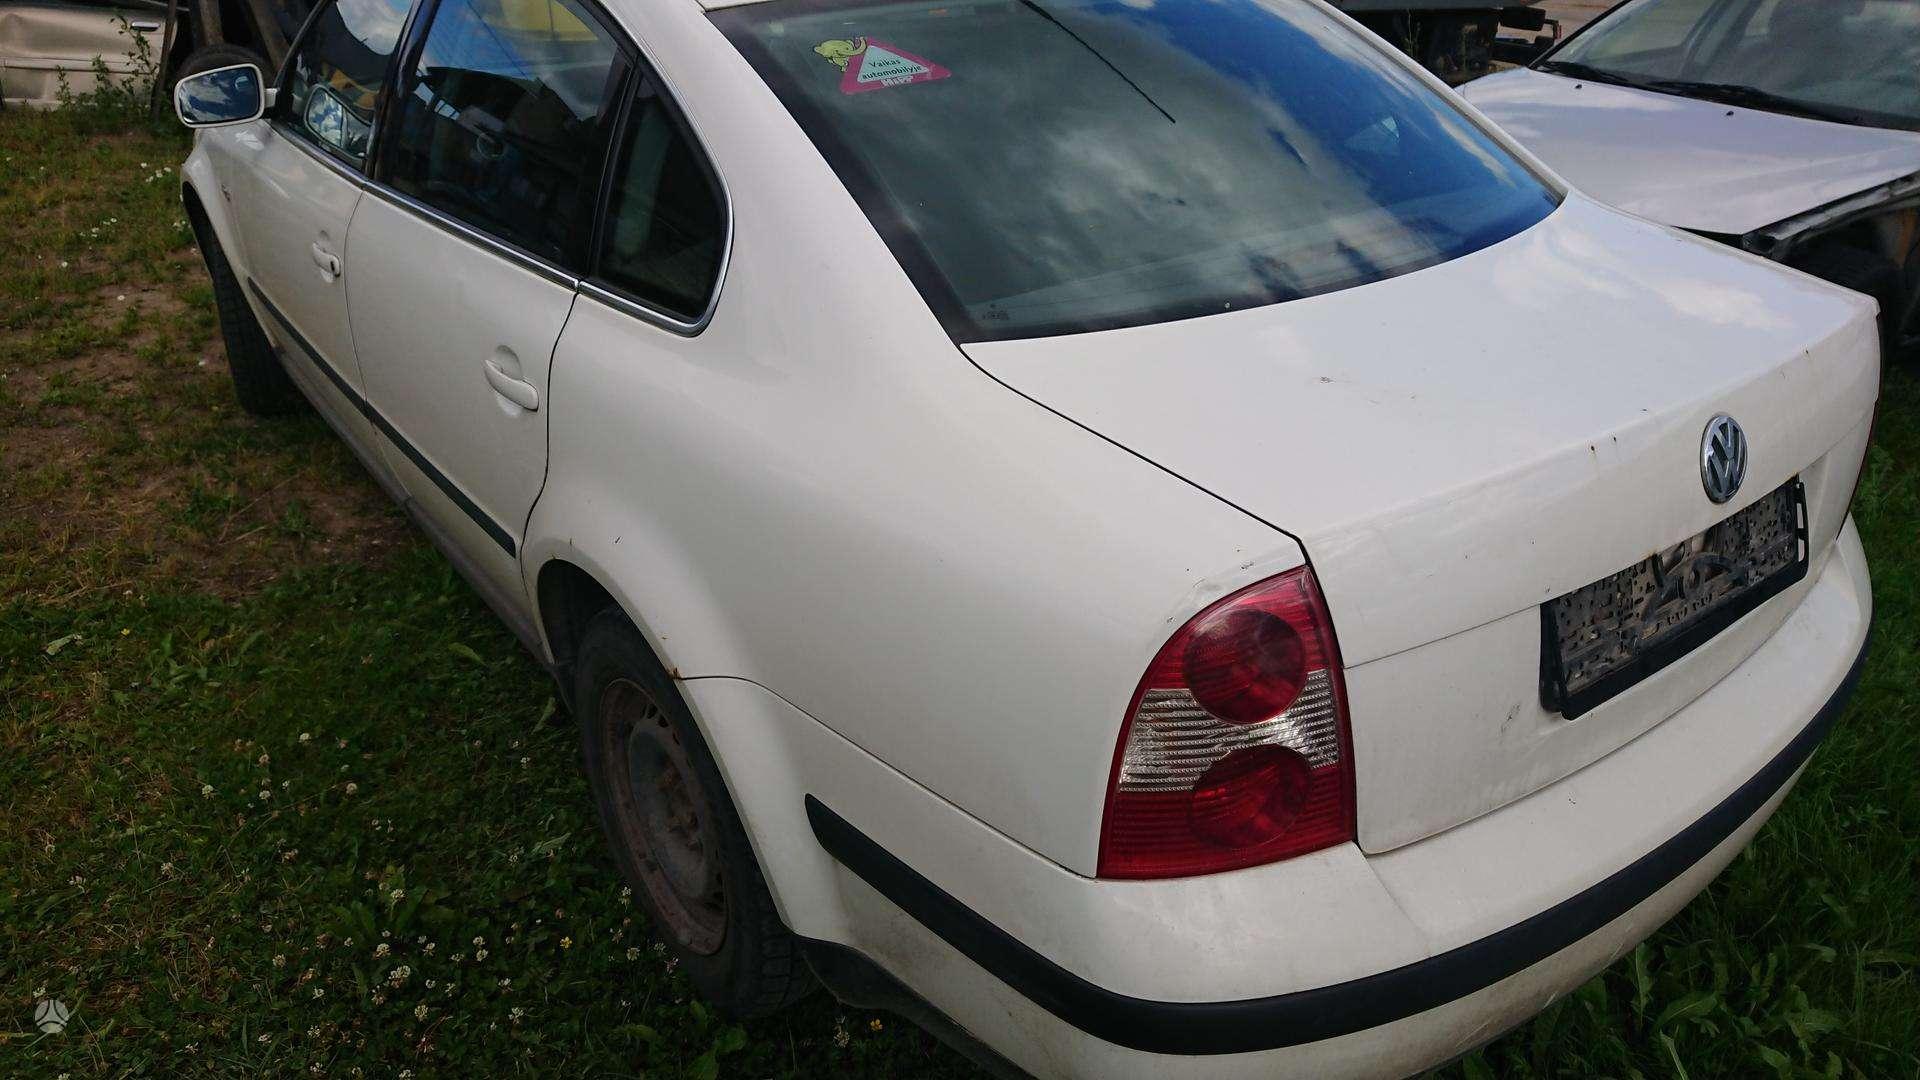 volkswagen-passat-dalimis-vw-passat-2001-2006m-1-9tdi-74kw-96 ddf